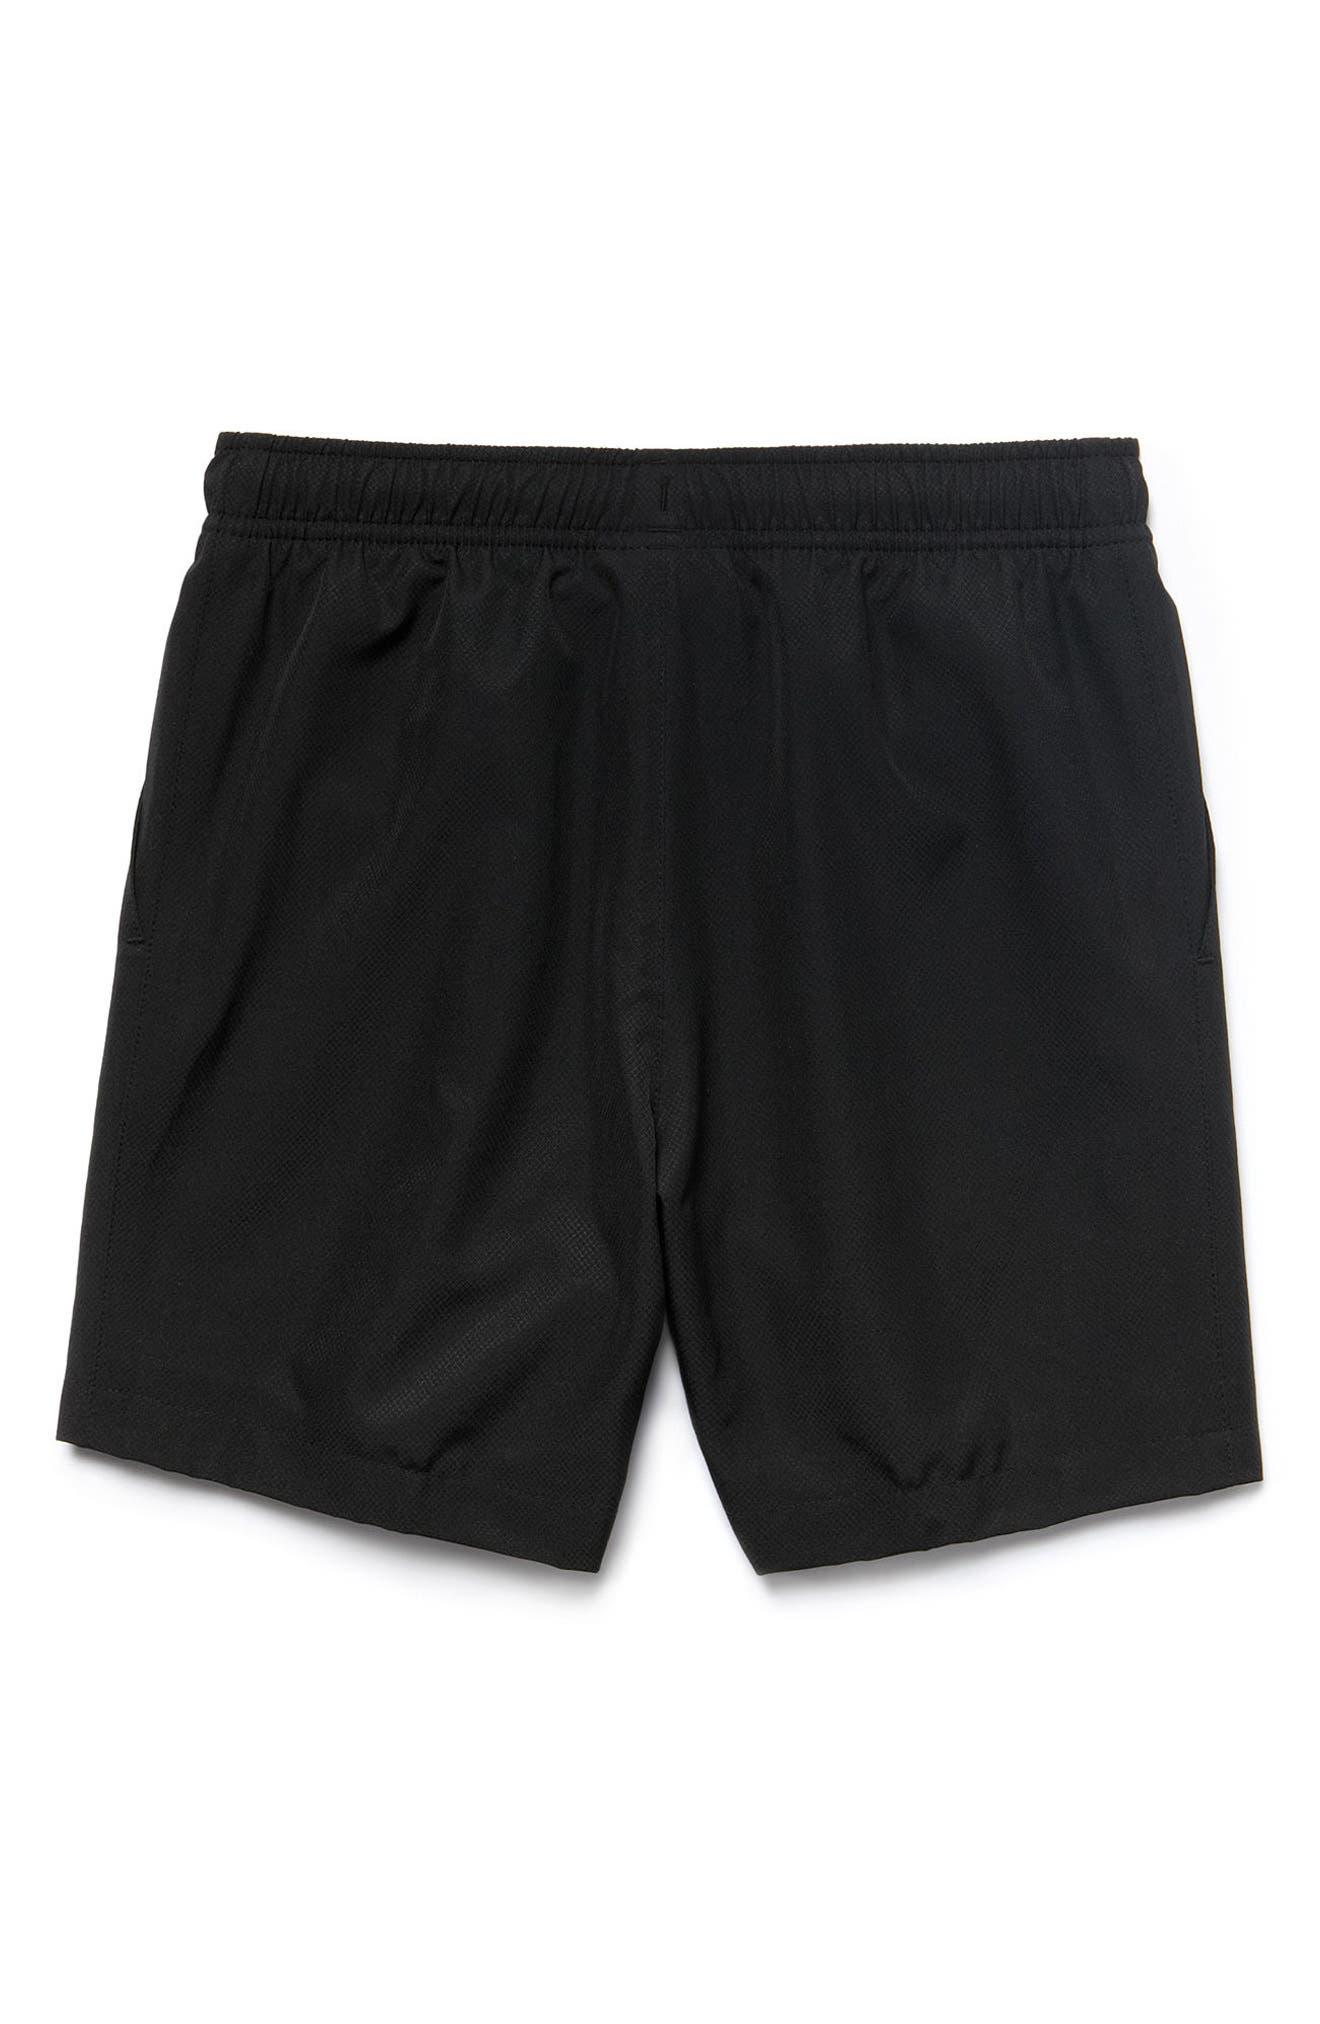 Sport Tennis Shorts,                             Alternate thumbnail 2, color,                             001